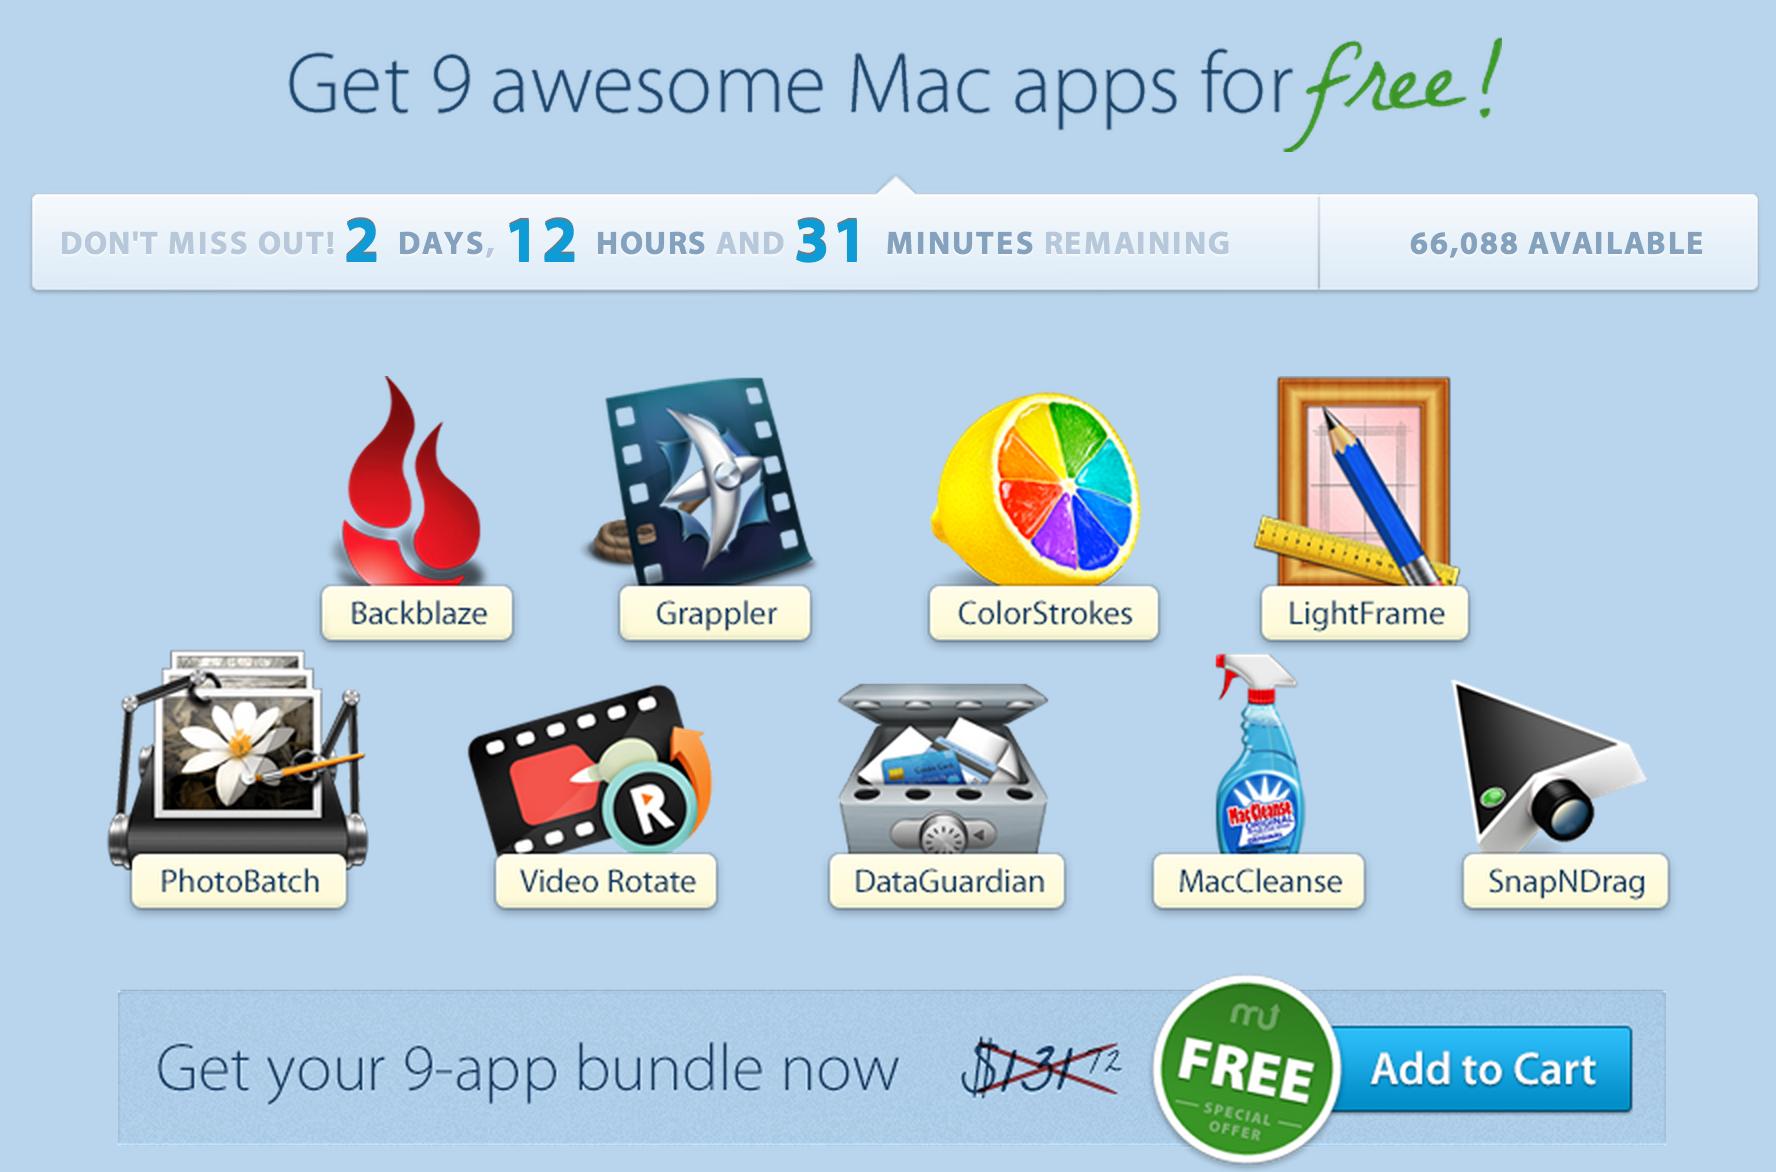 Free Mac App bundle: Grappler, MacCleanse, Data Guardian, Video